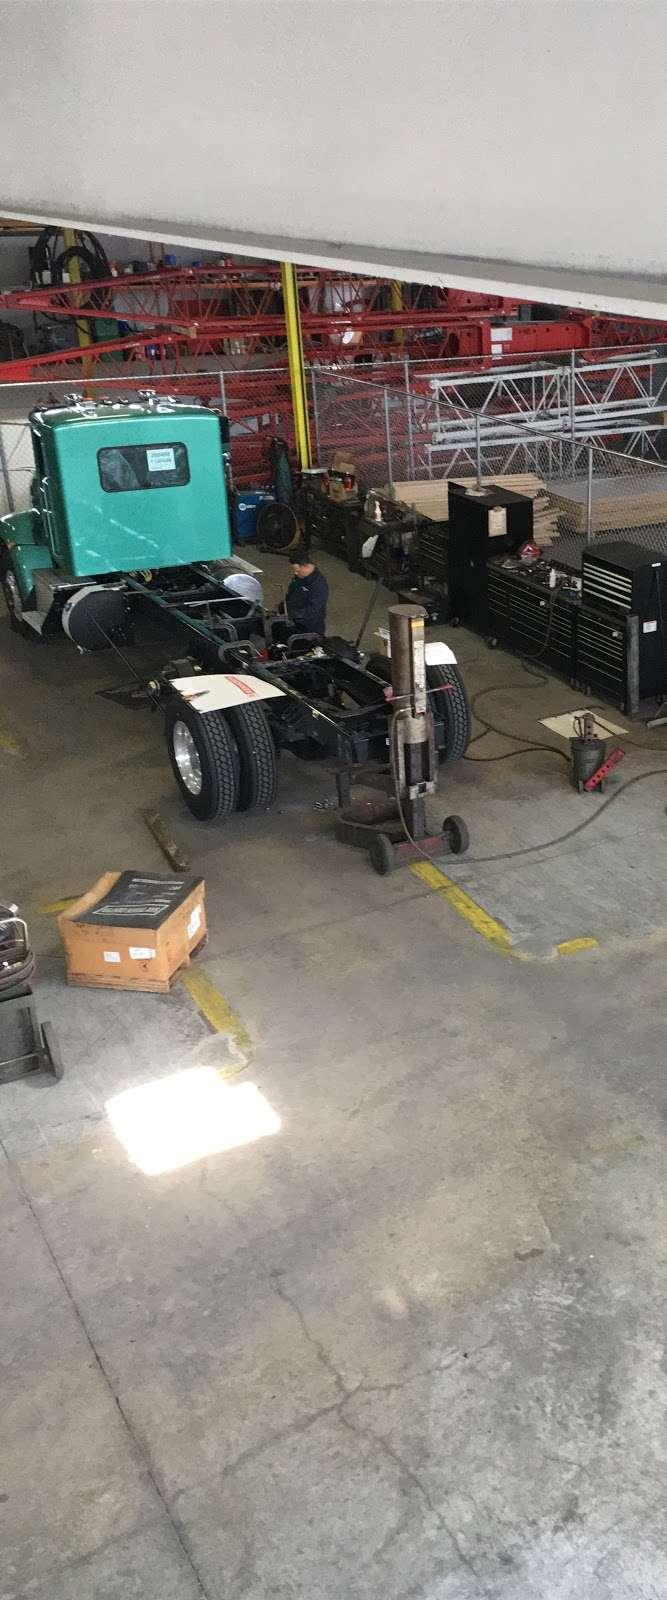 JOSEPH DANISI TRUCKS INC. - car repair    Photo 5 of 7   Address: 1030 Grand Blvd, Deer Park, NY 11729, USA   Phone: (631) 392-4000